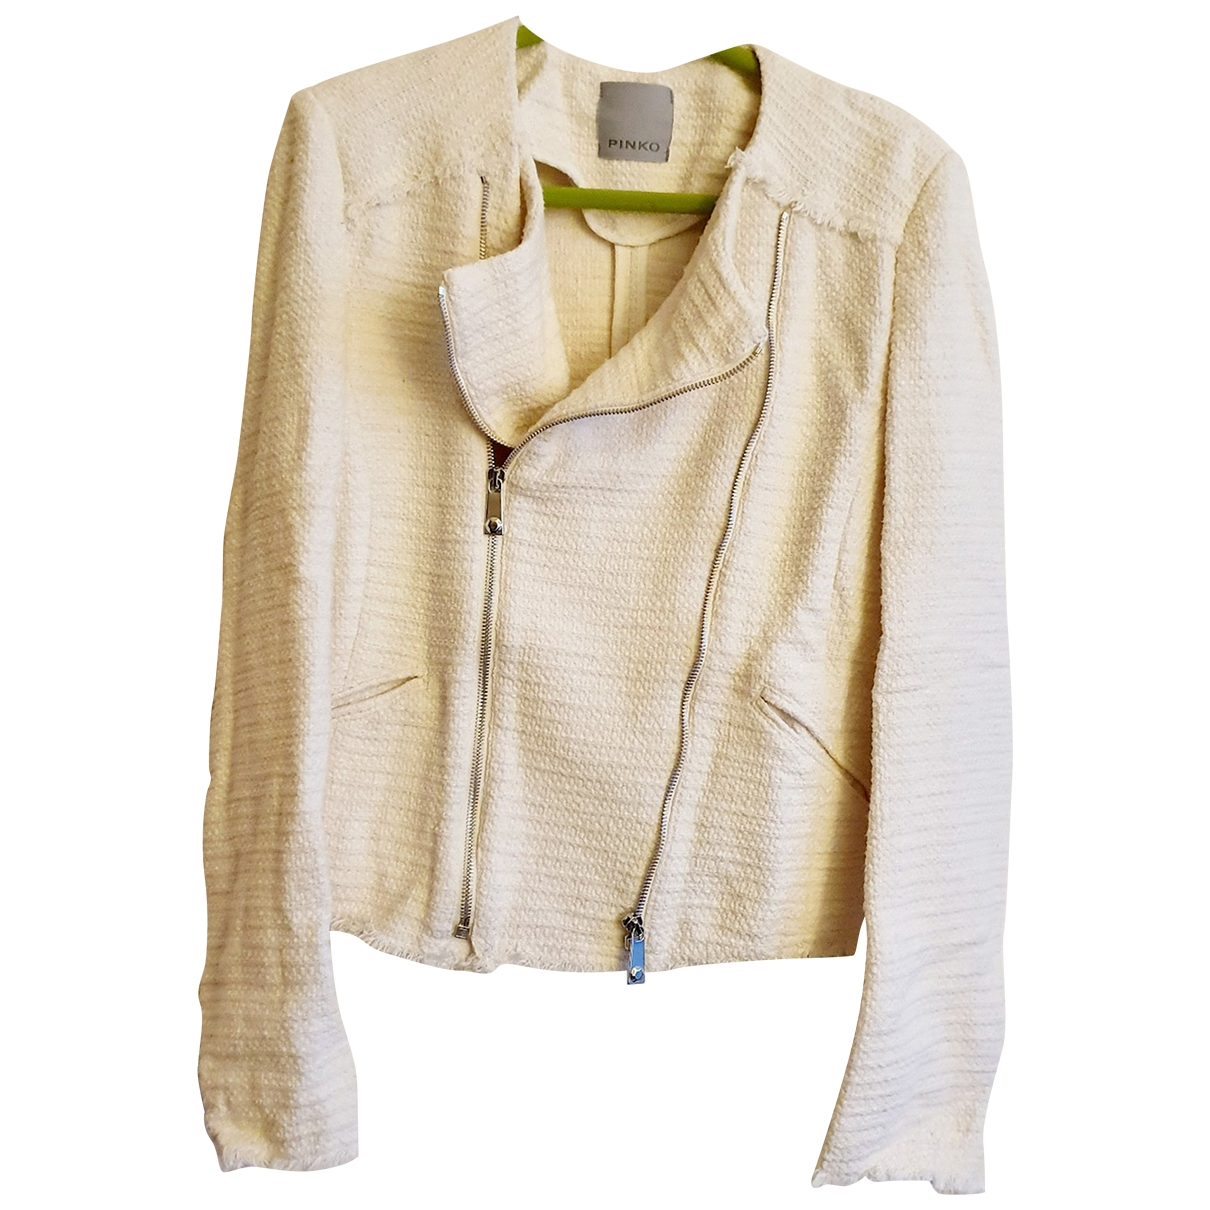 Pinko \N Ecru Cotton jacket for Women 36 FR